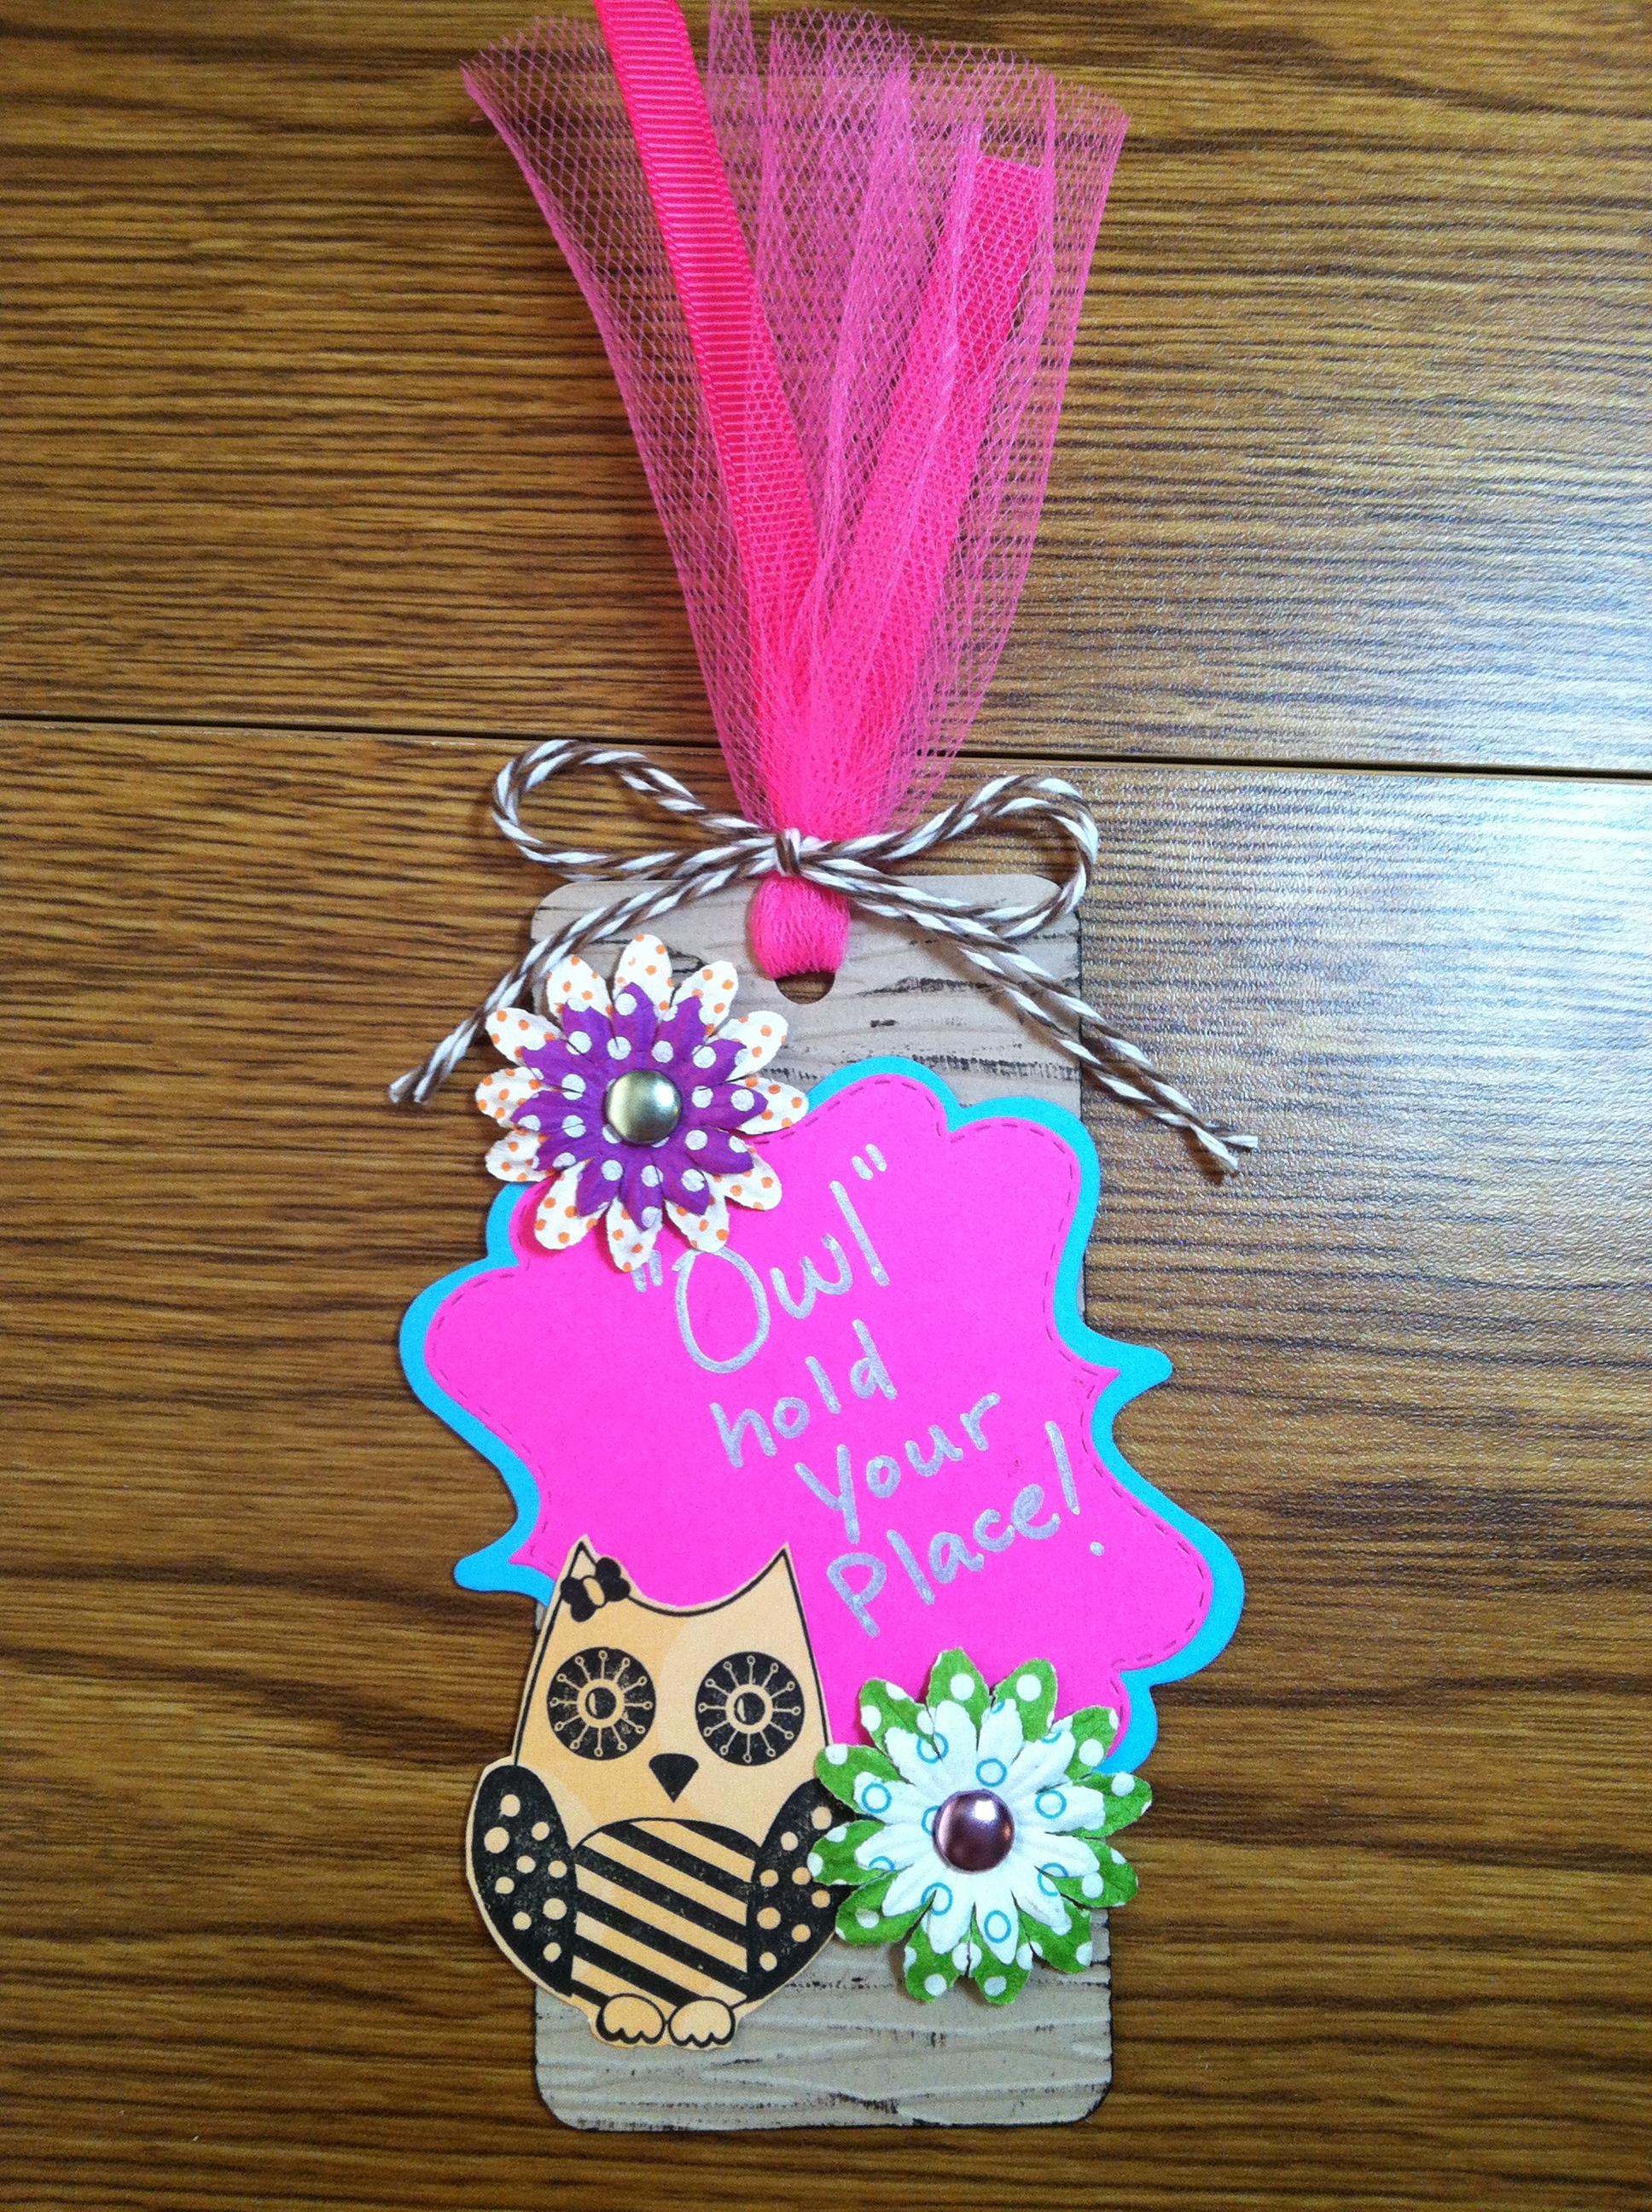 Night owl themed slumber party events to celebrate - Decoracion con buhos ...